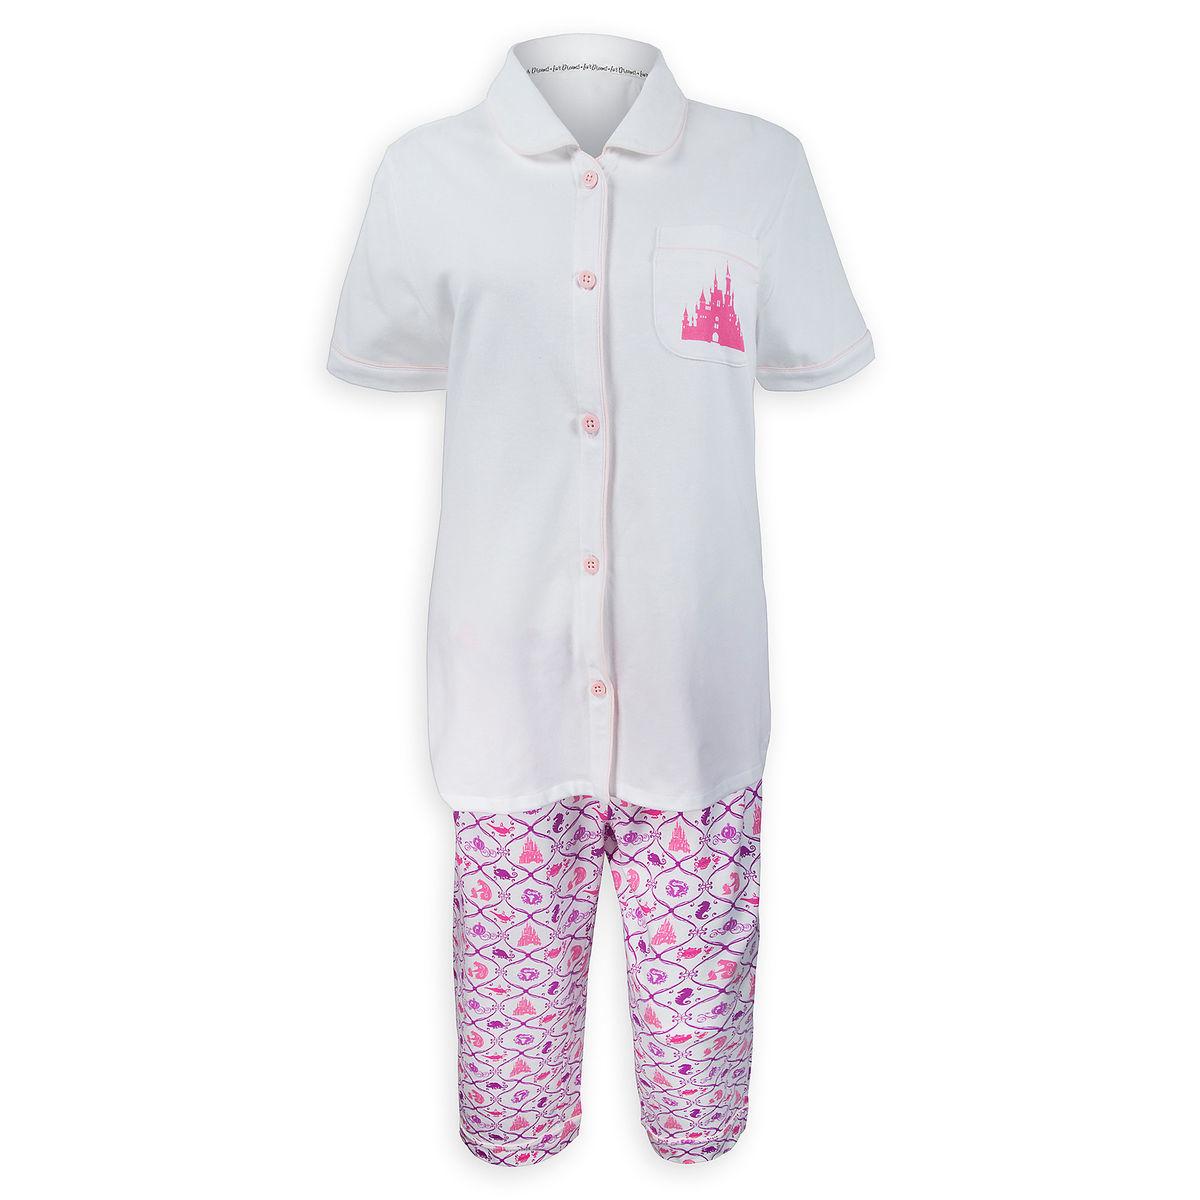 a8b049341d Disney Women s Pajama Set - Disney Princess Fantasyland Castle